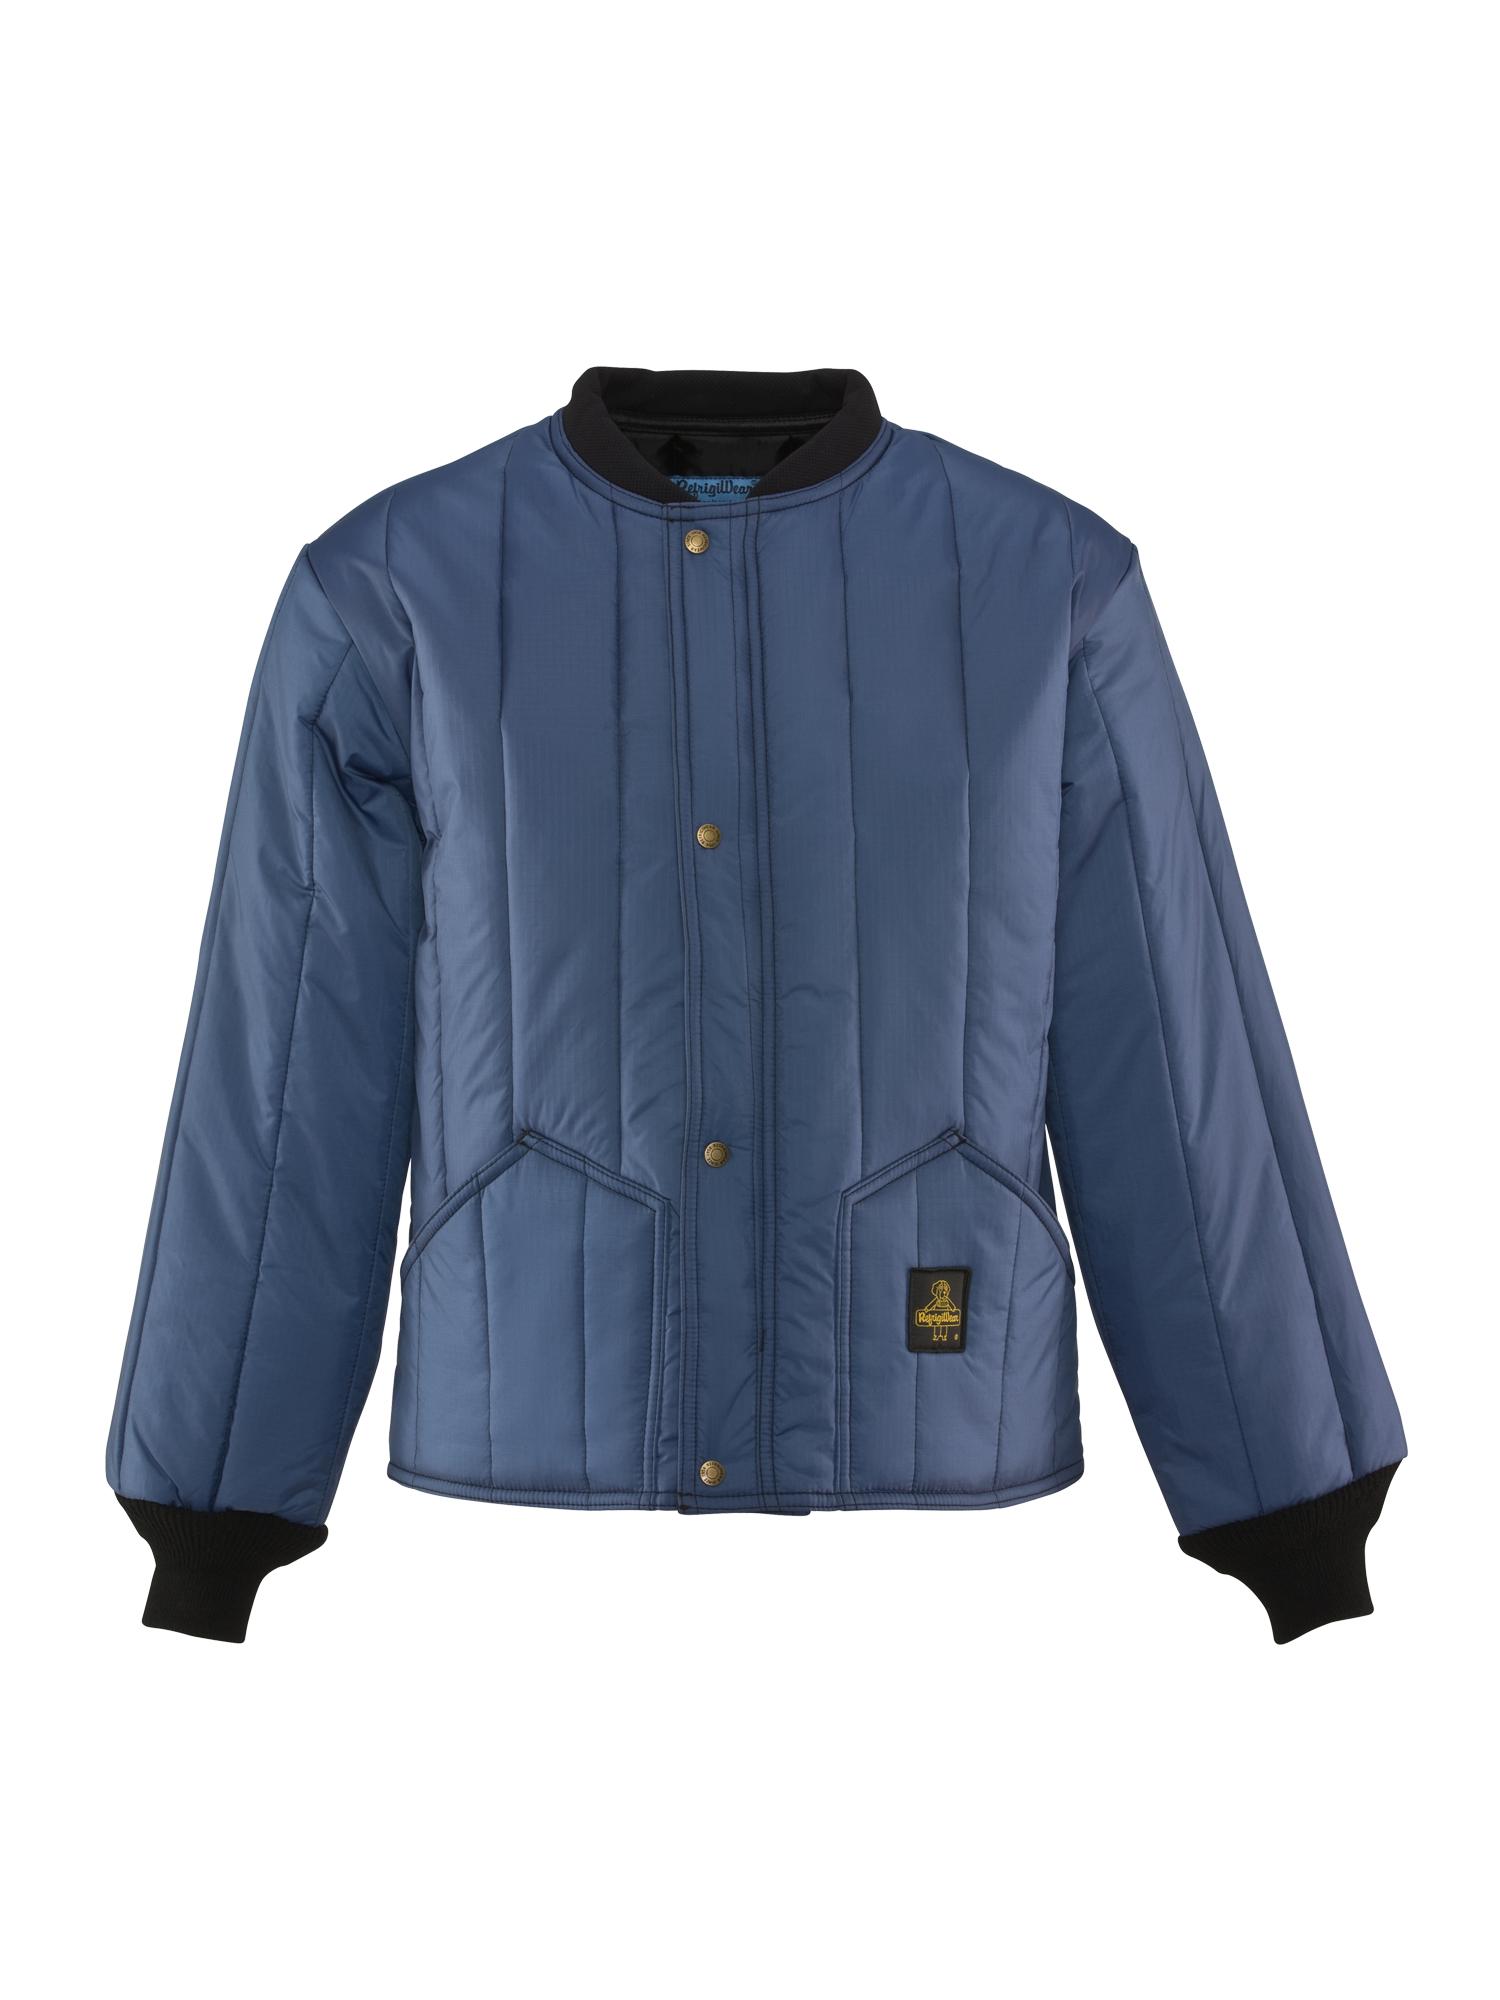 Refrigiwear , Cooler Wear™ Jacket , Navy , X-Small , Regular , Polyester/Nylon